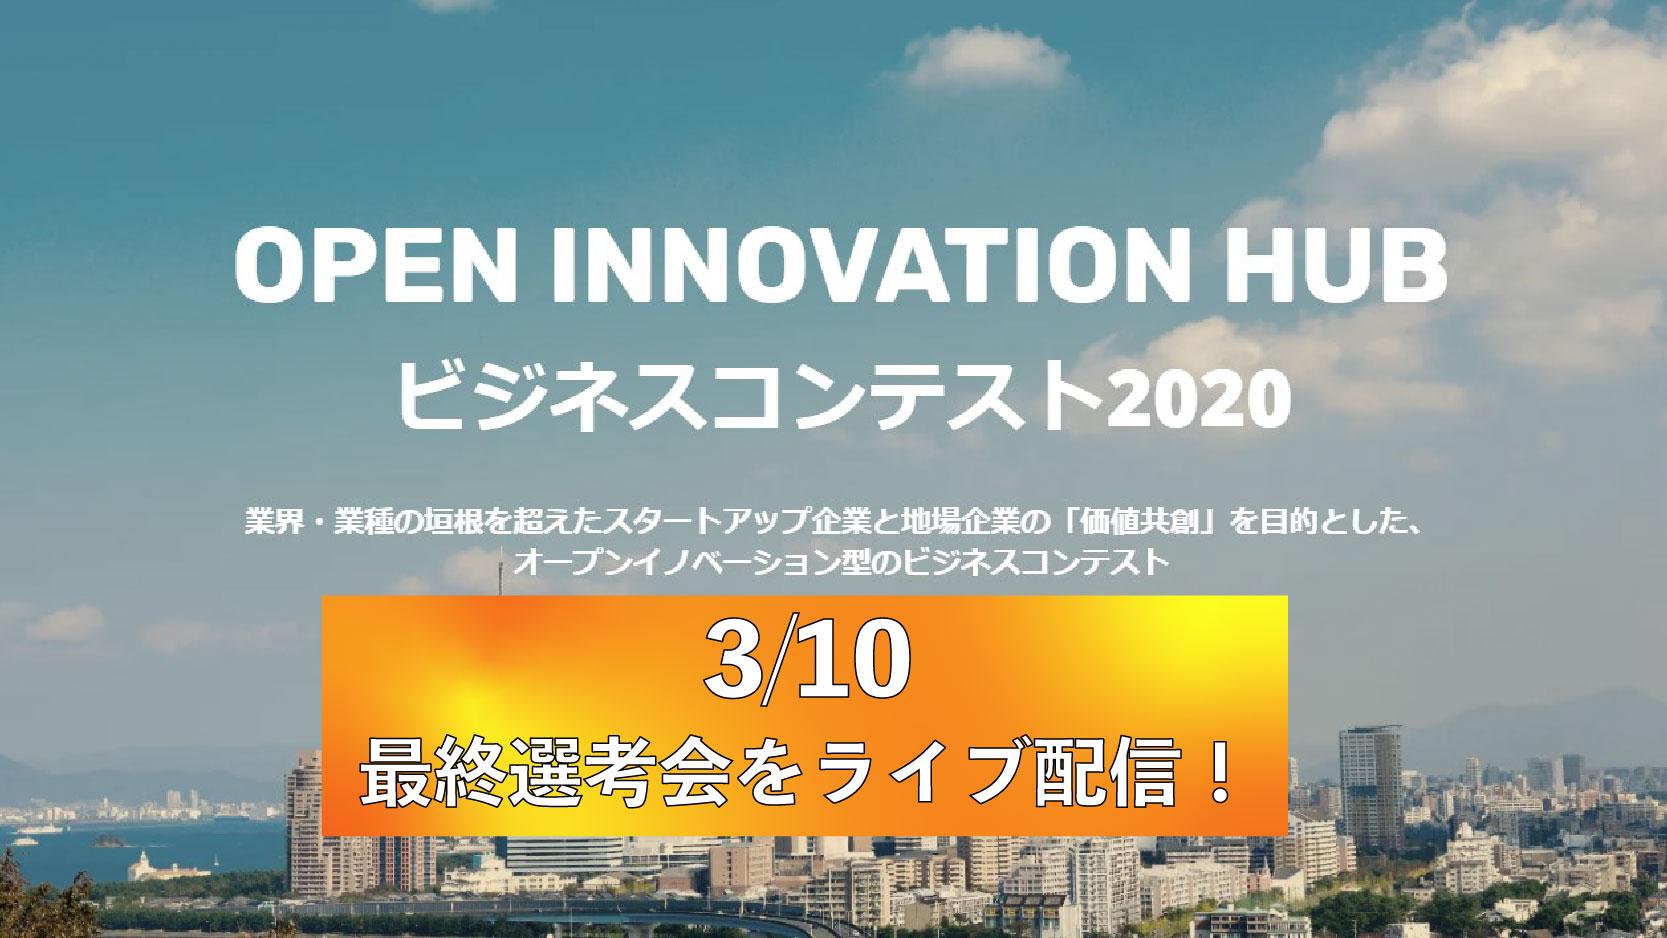 OPEN INNOVATION HUB ビジネスコンテスト2020最終選考会